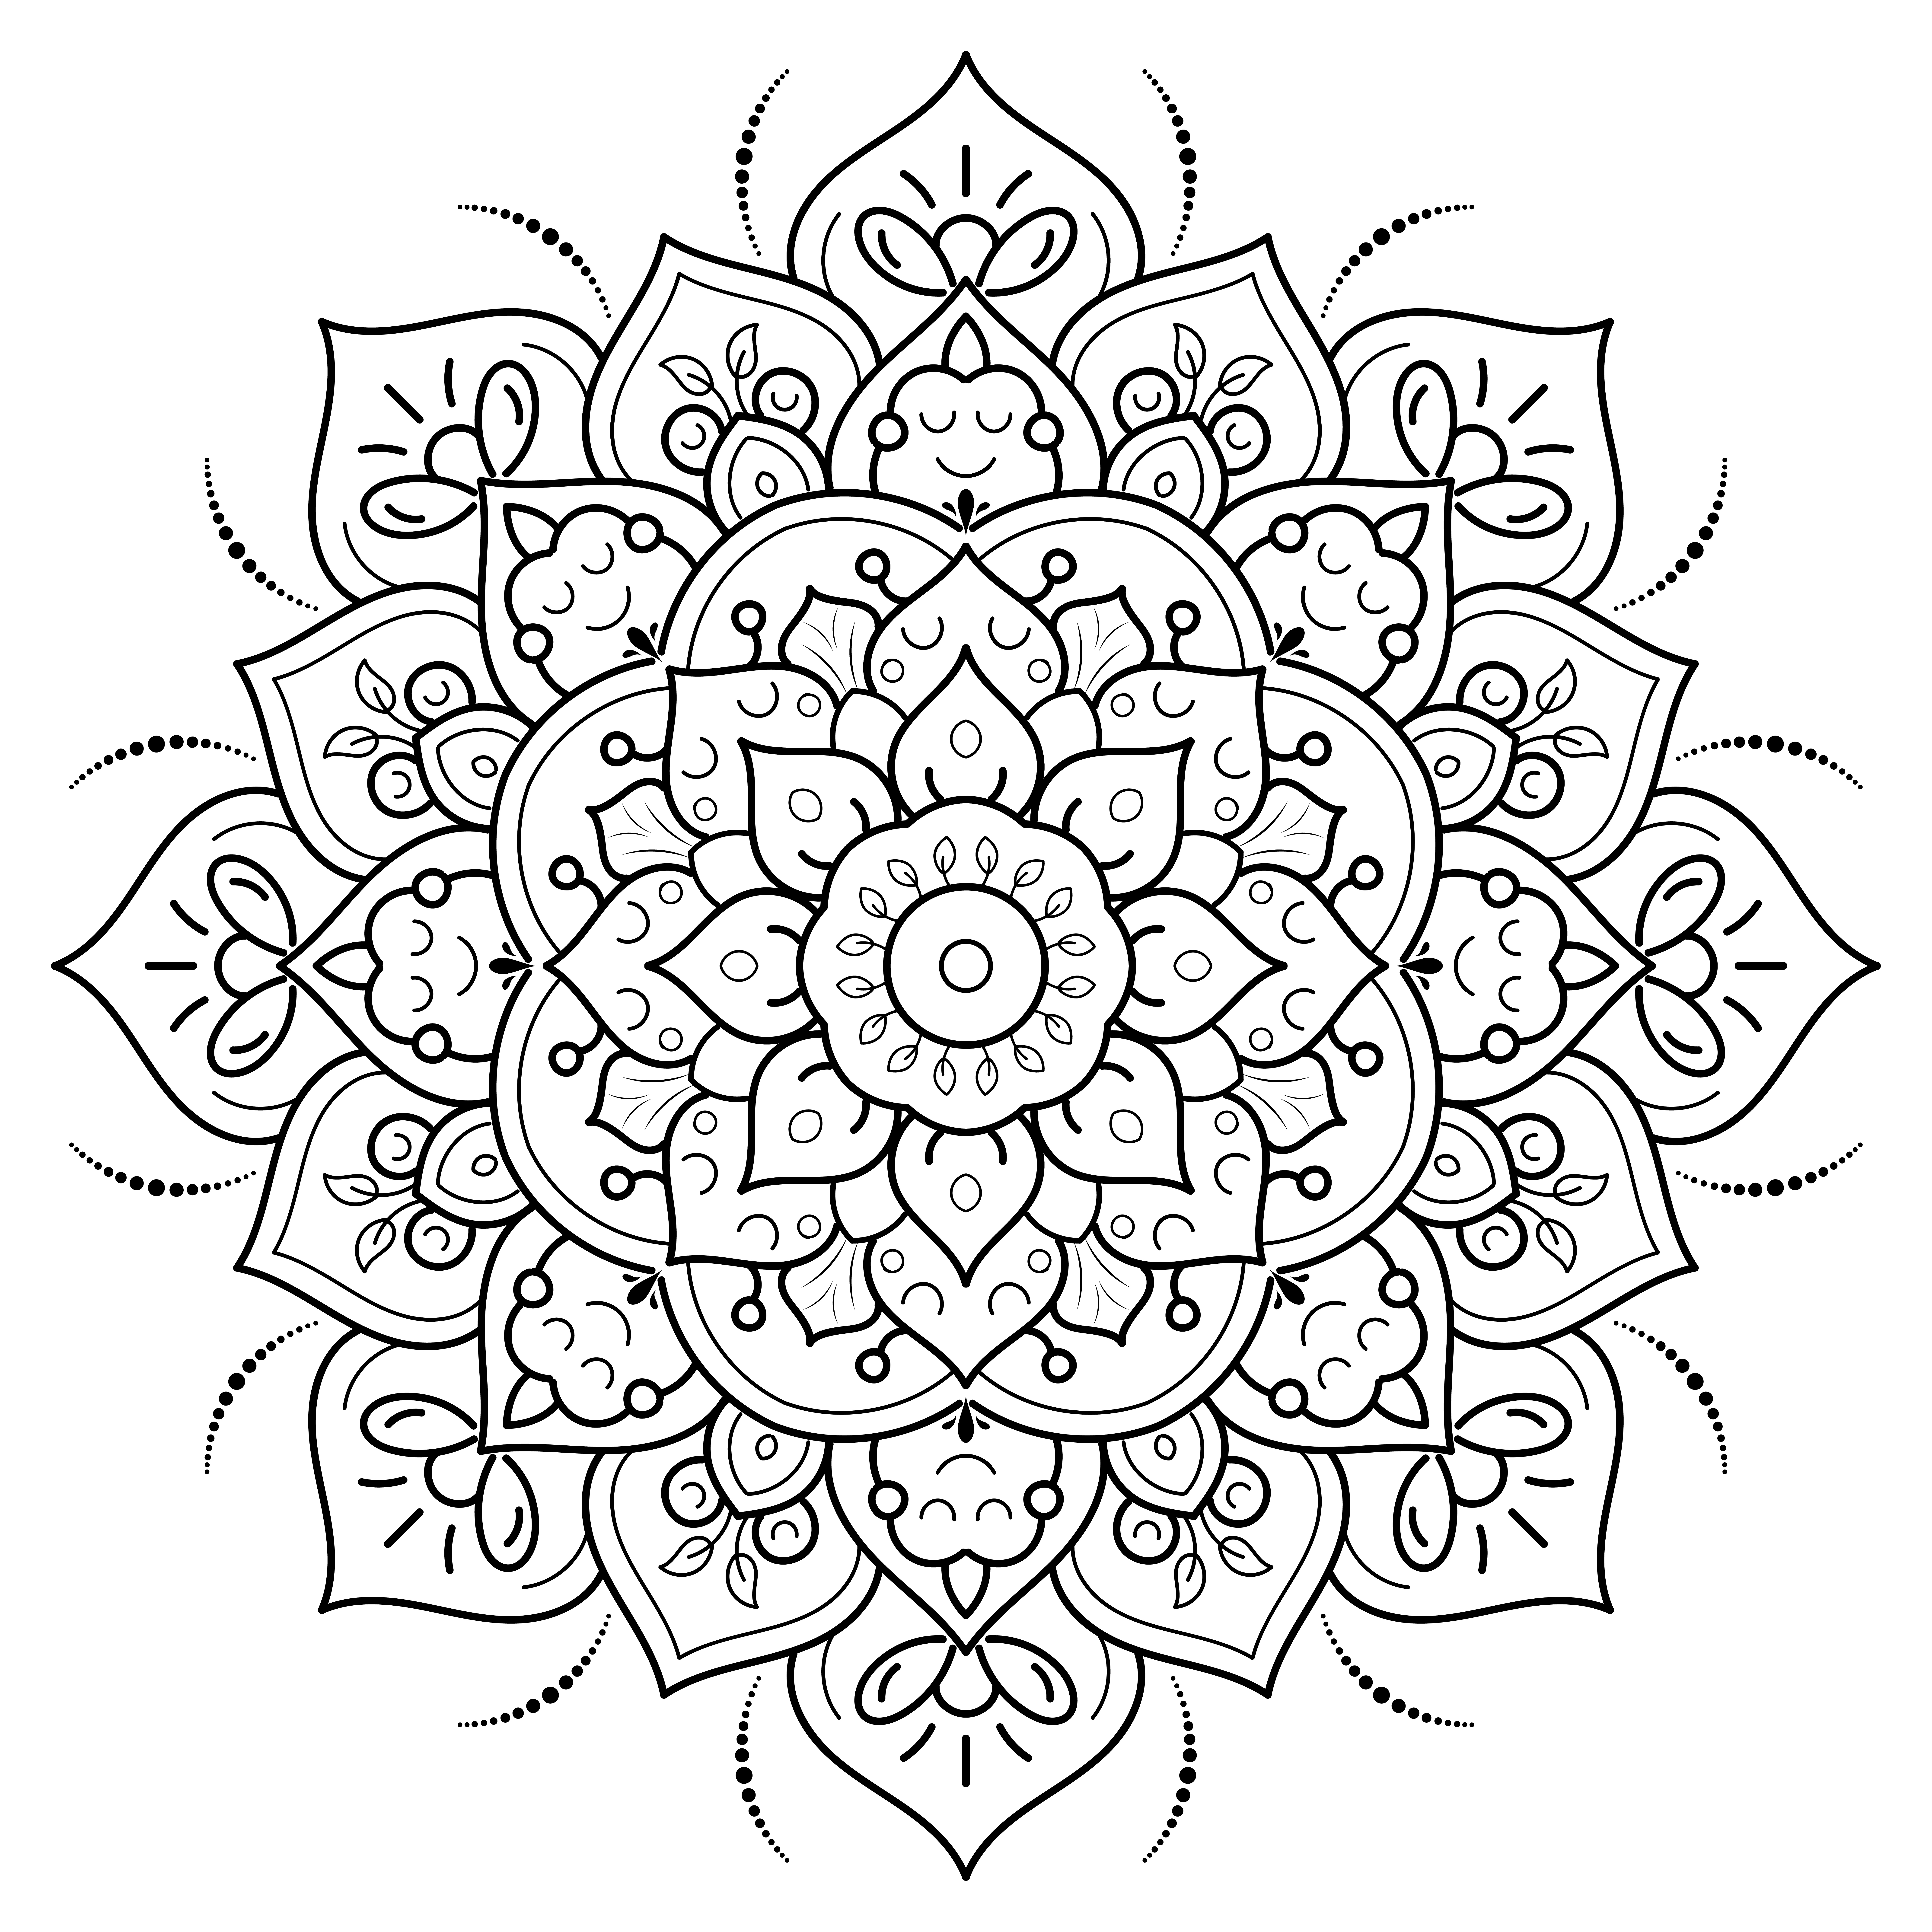 Mandala Sunflower Mandala Coloring Pages Beautiful Cool Vases ... | 8334x8334